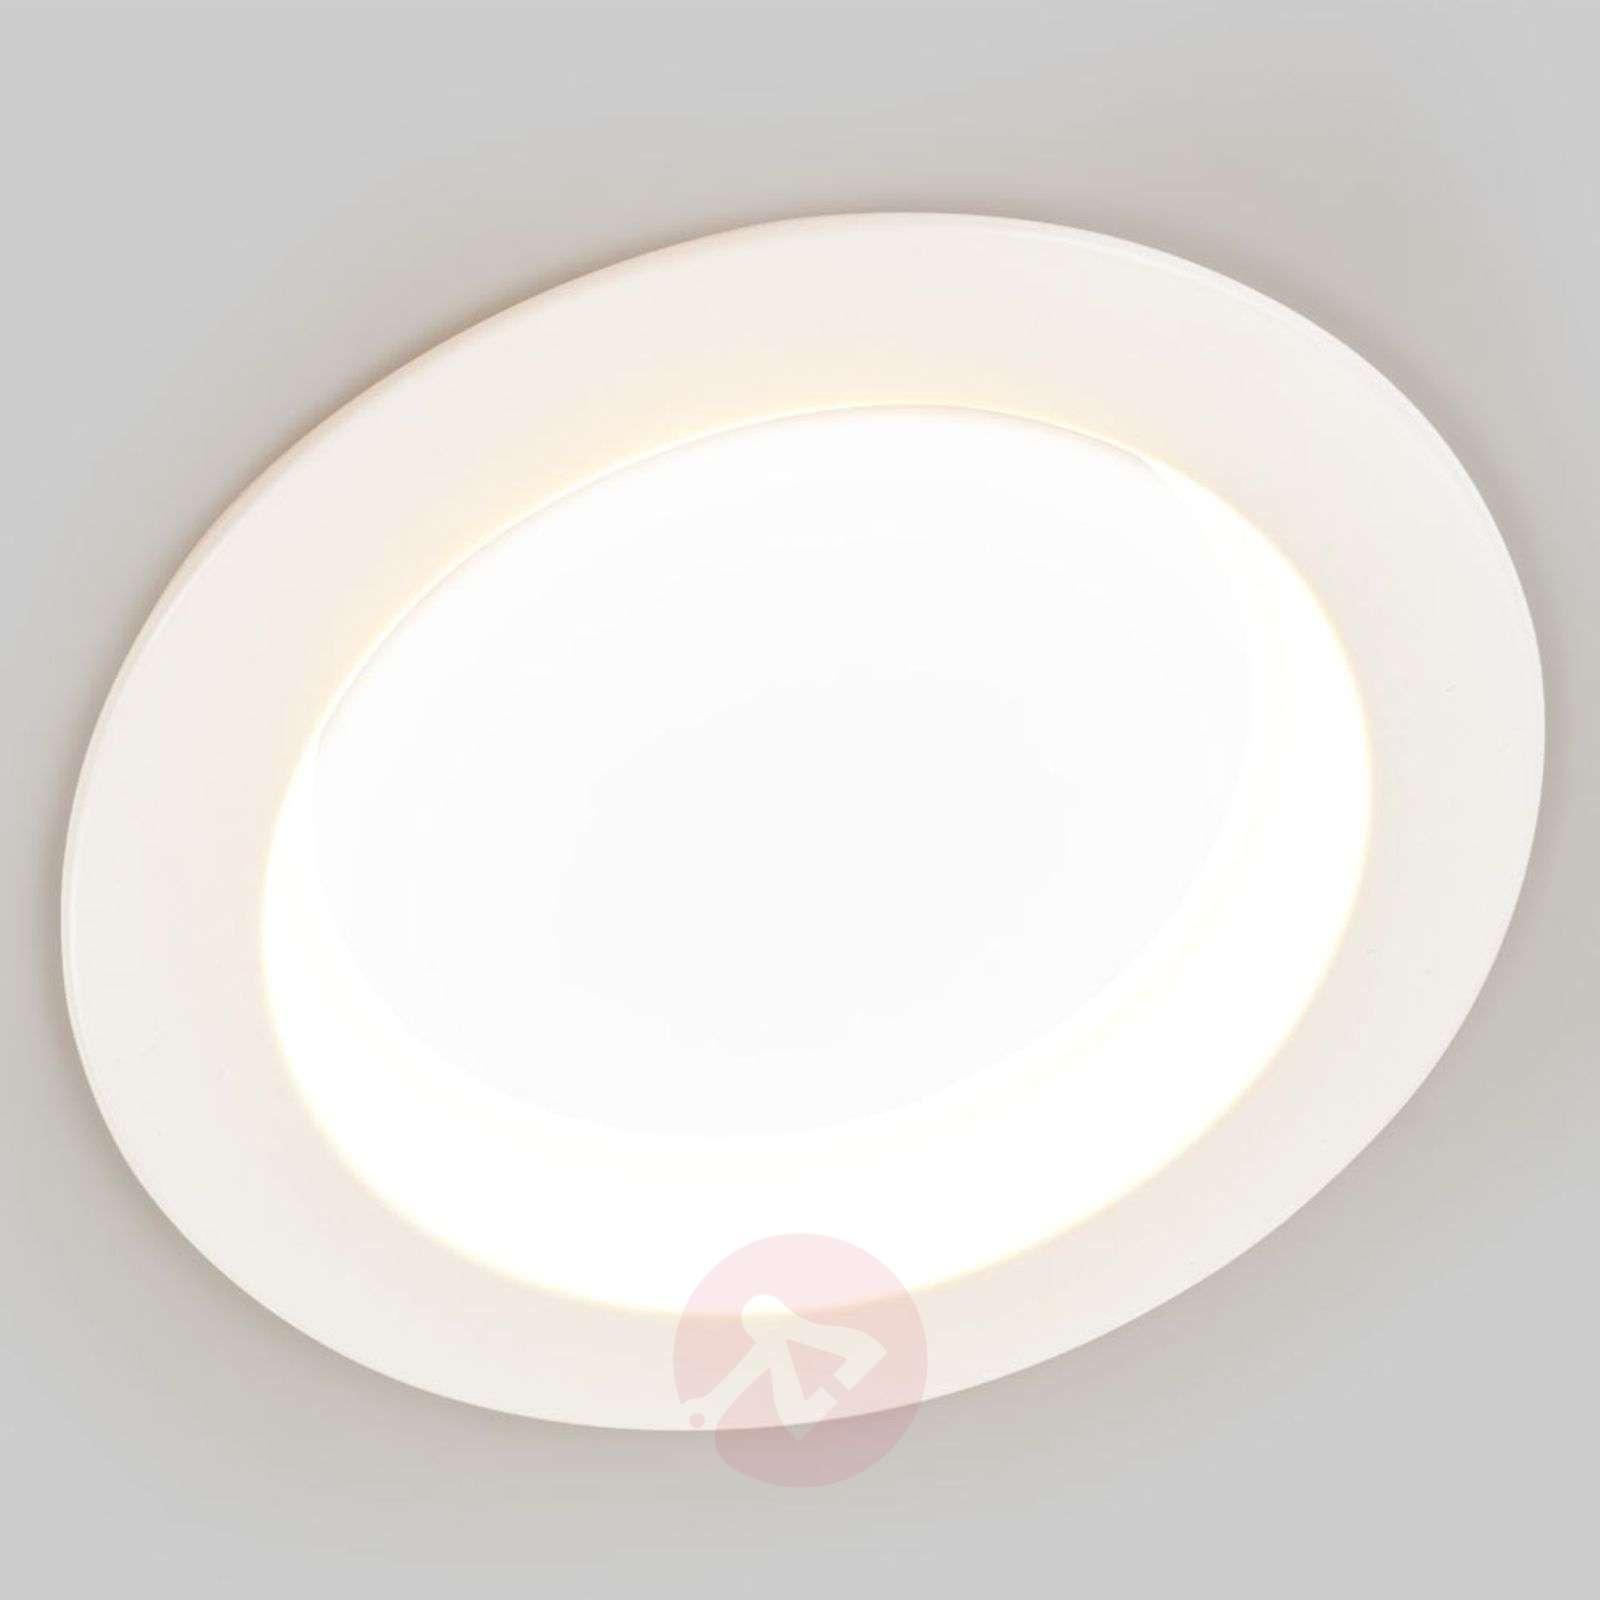 27 W LED-valaisin Piet, 3000 K 4000 K 6000 K-9978036-020